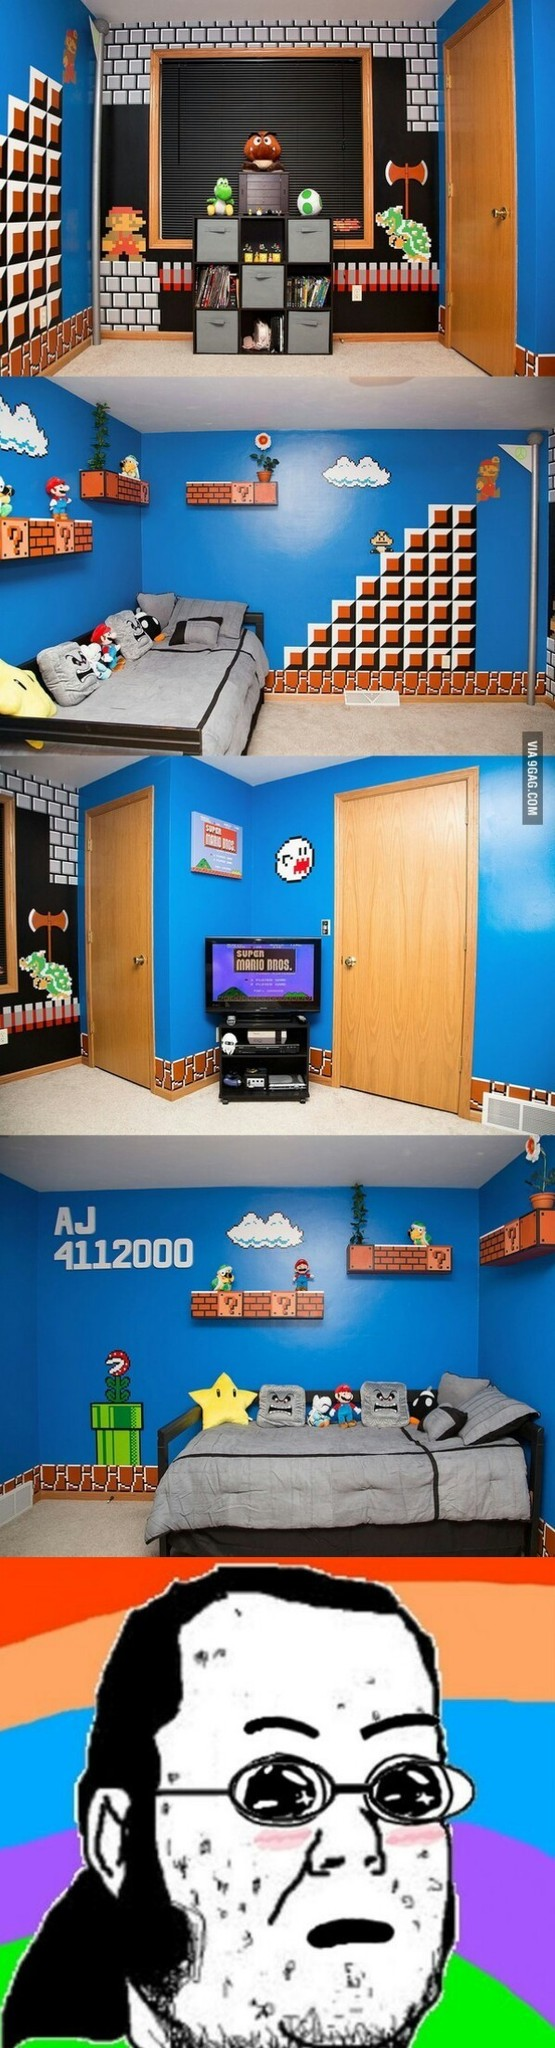 La habitacion de mis sueños - meme